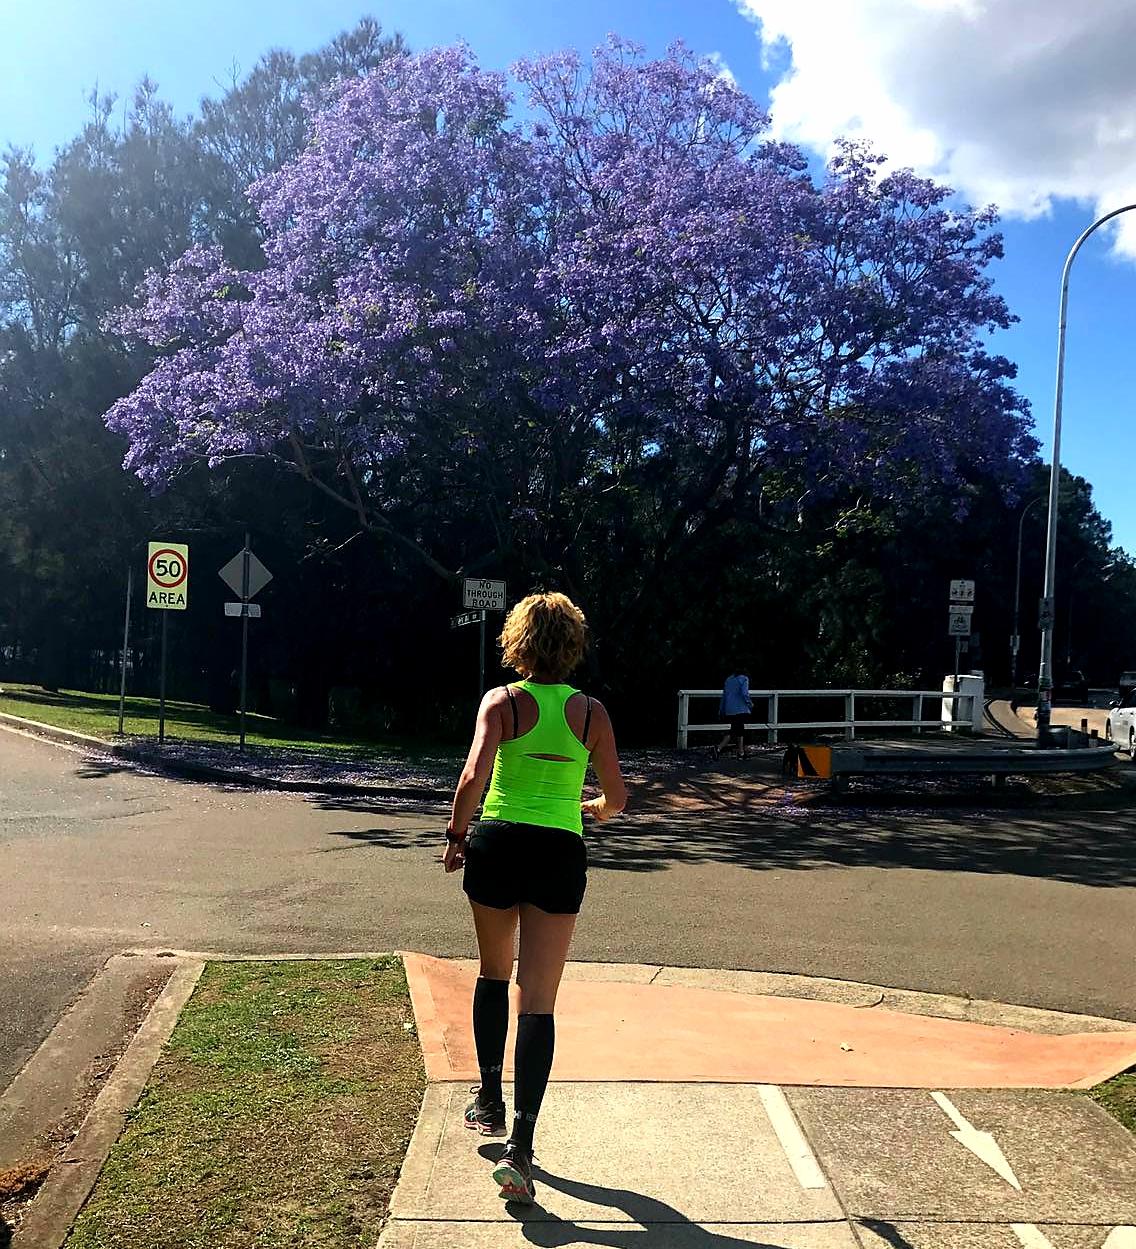 Hardlopen in Manly, paarse jacaranda